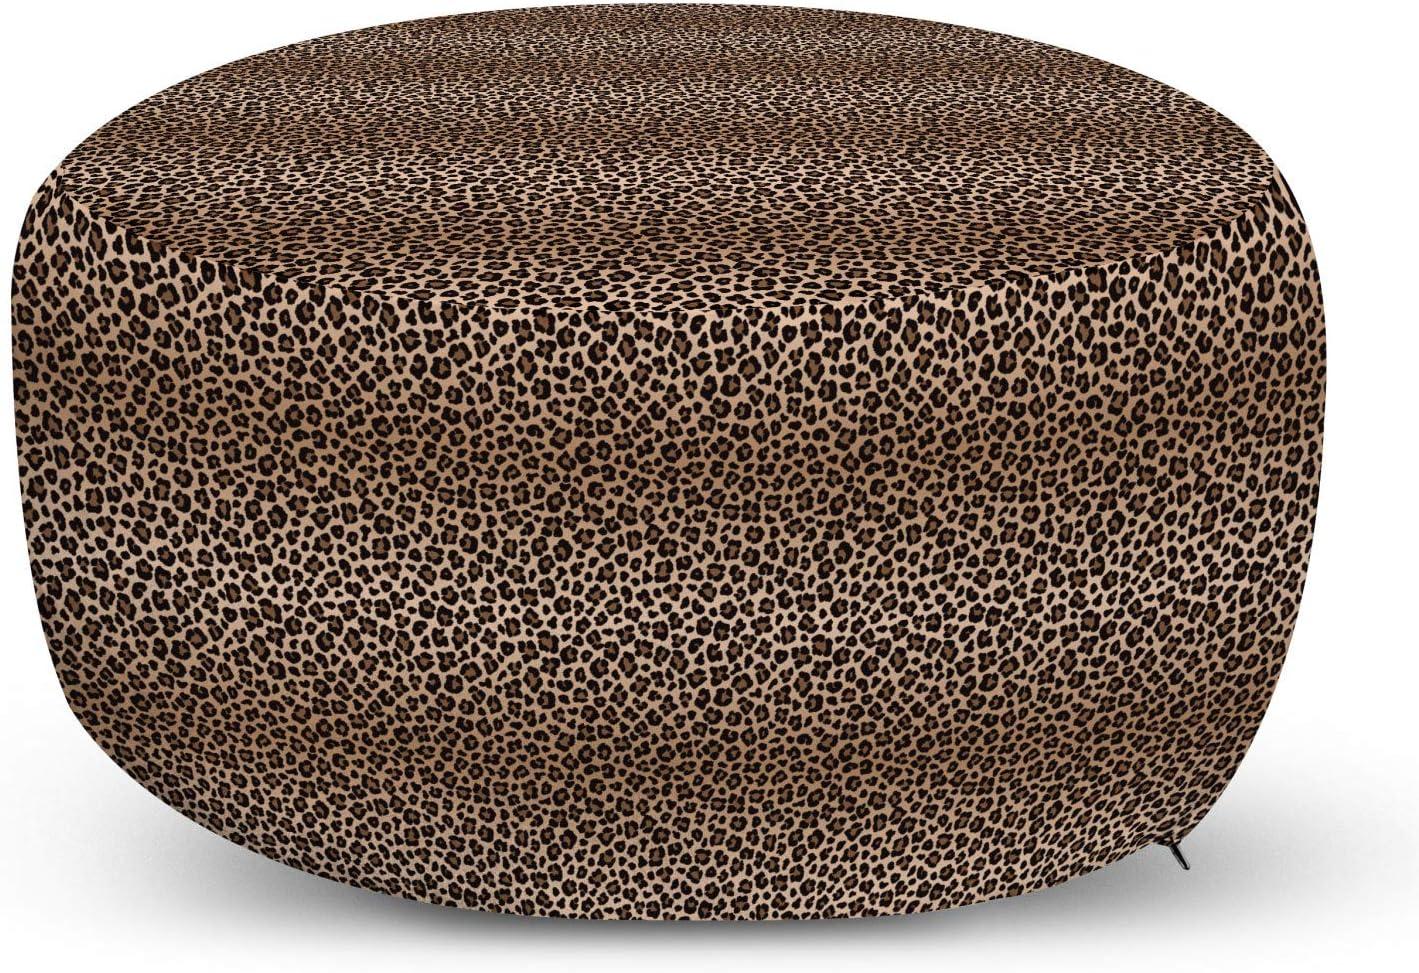 Lunarable Yellow Ombre Ottoman Pouf Tucson Mall Spots Insp Popular product Skin Leopard Fur